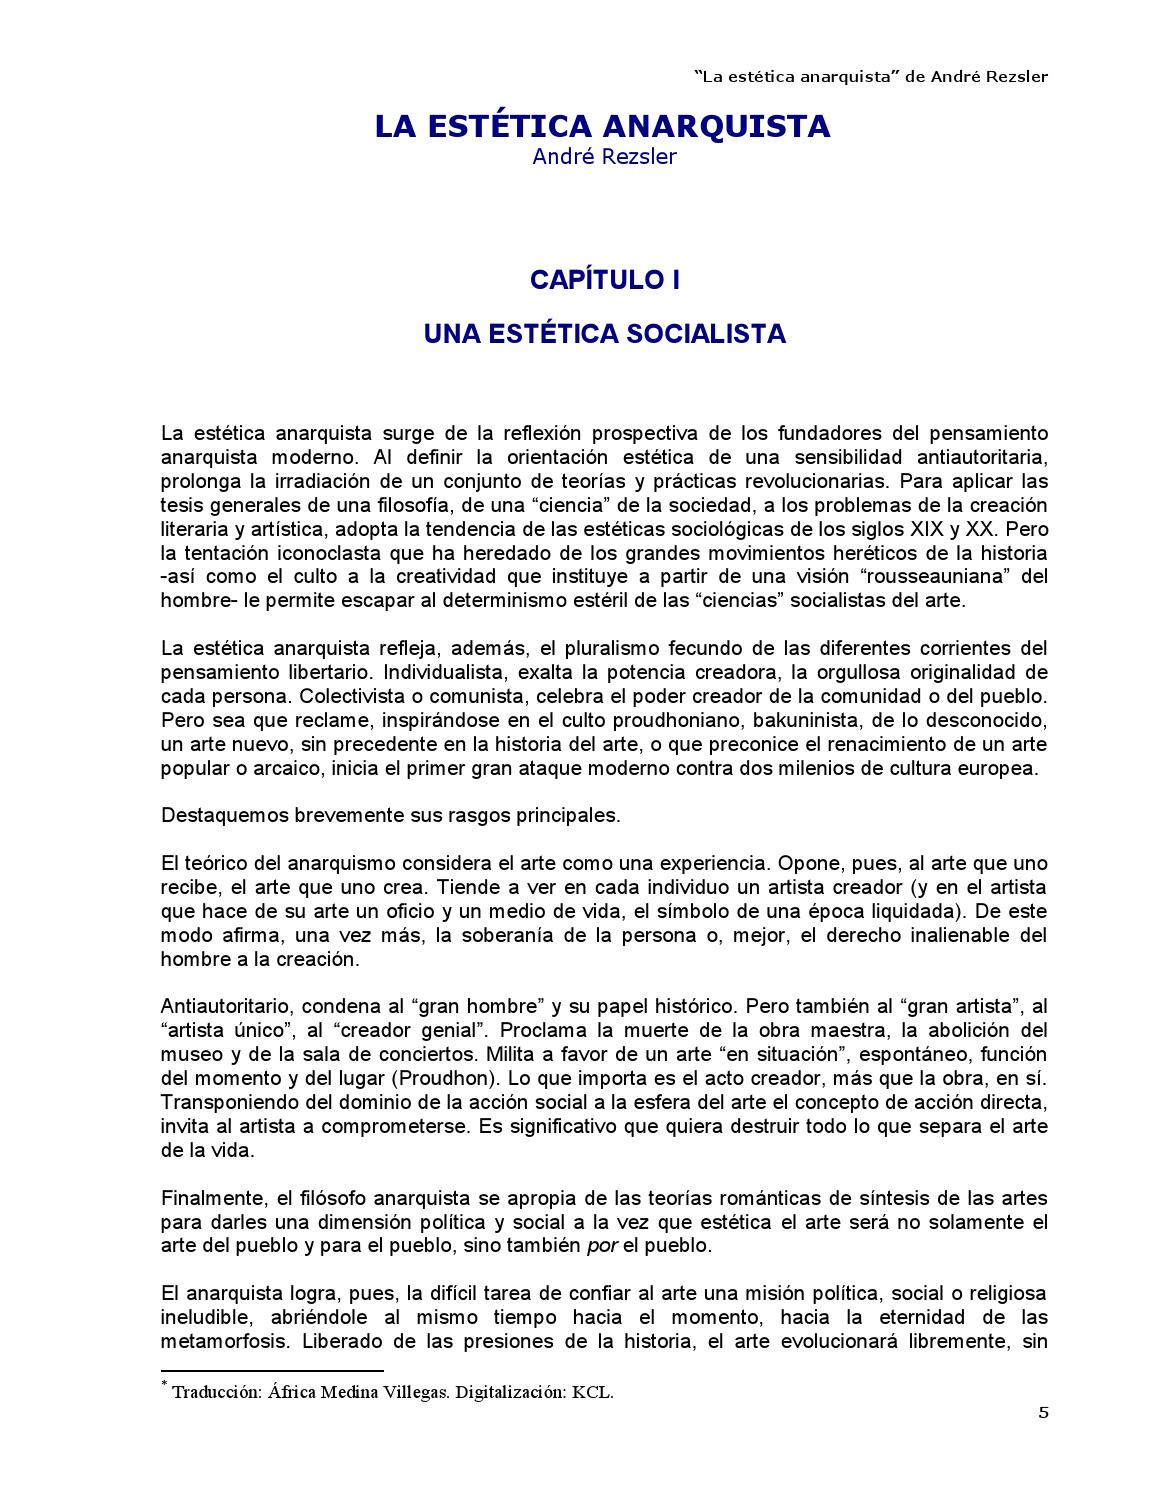 La estética anarquista - André Rezsler by Kclibertaria - issuu